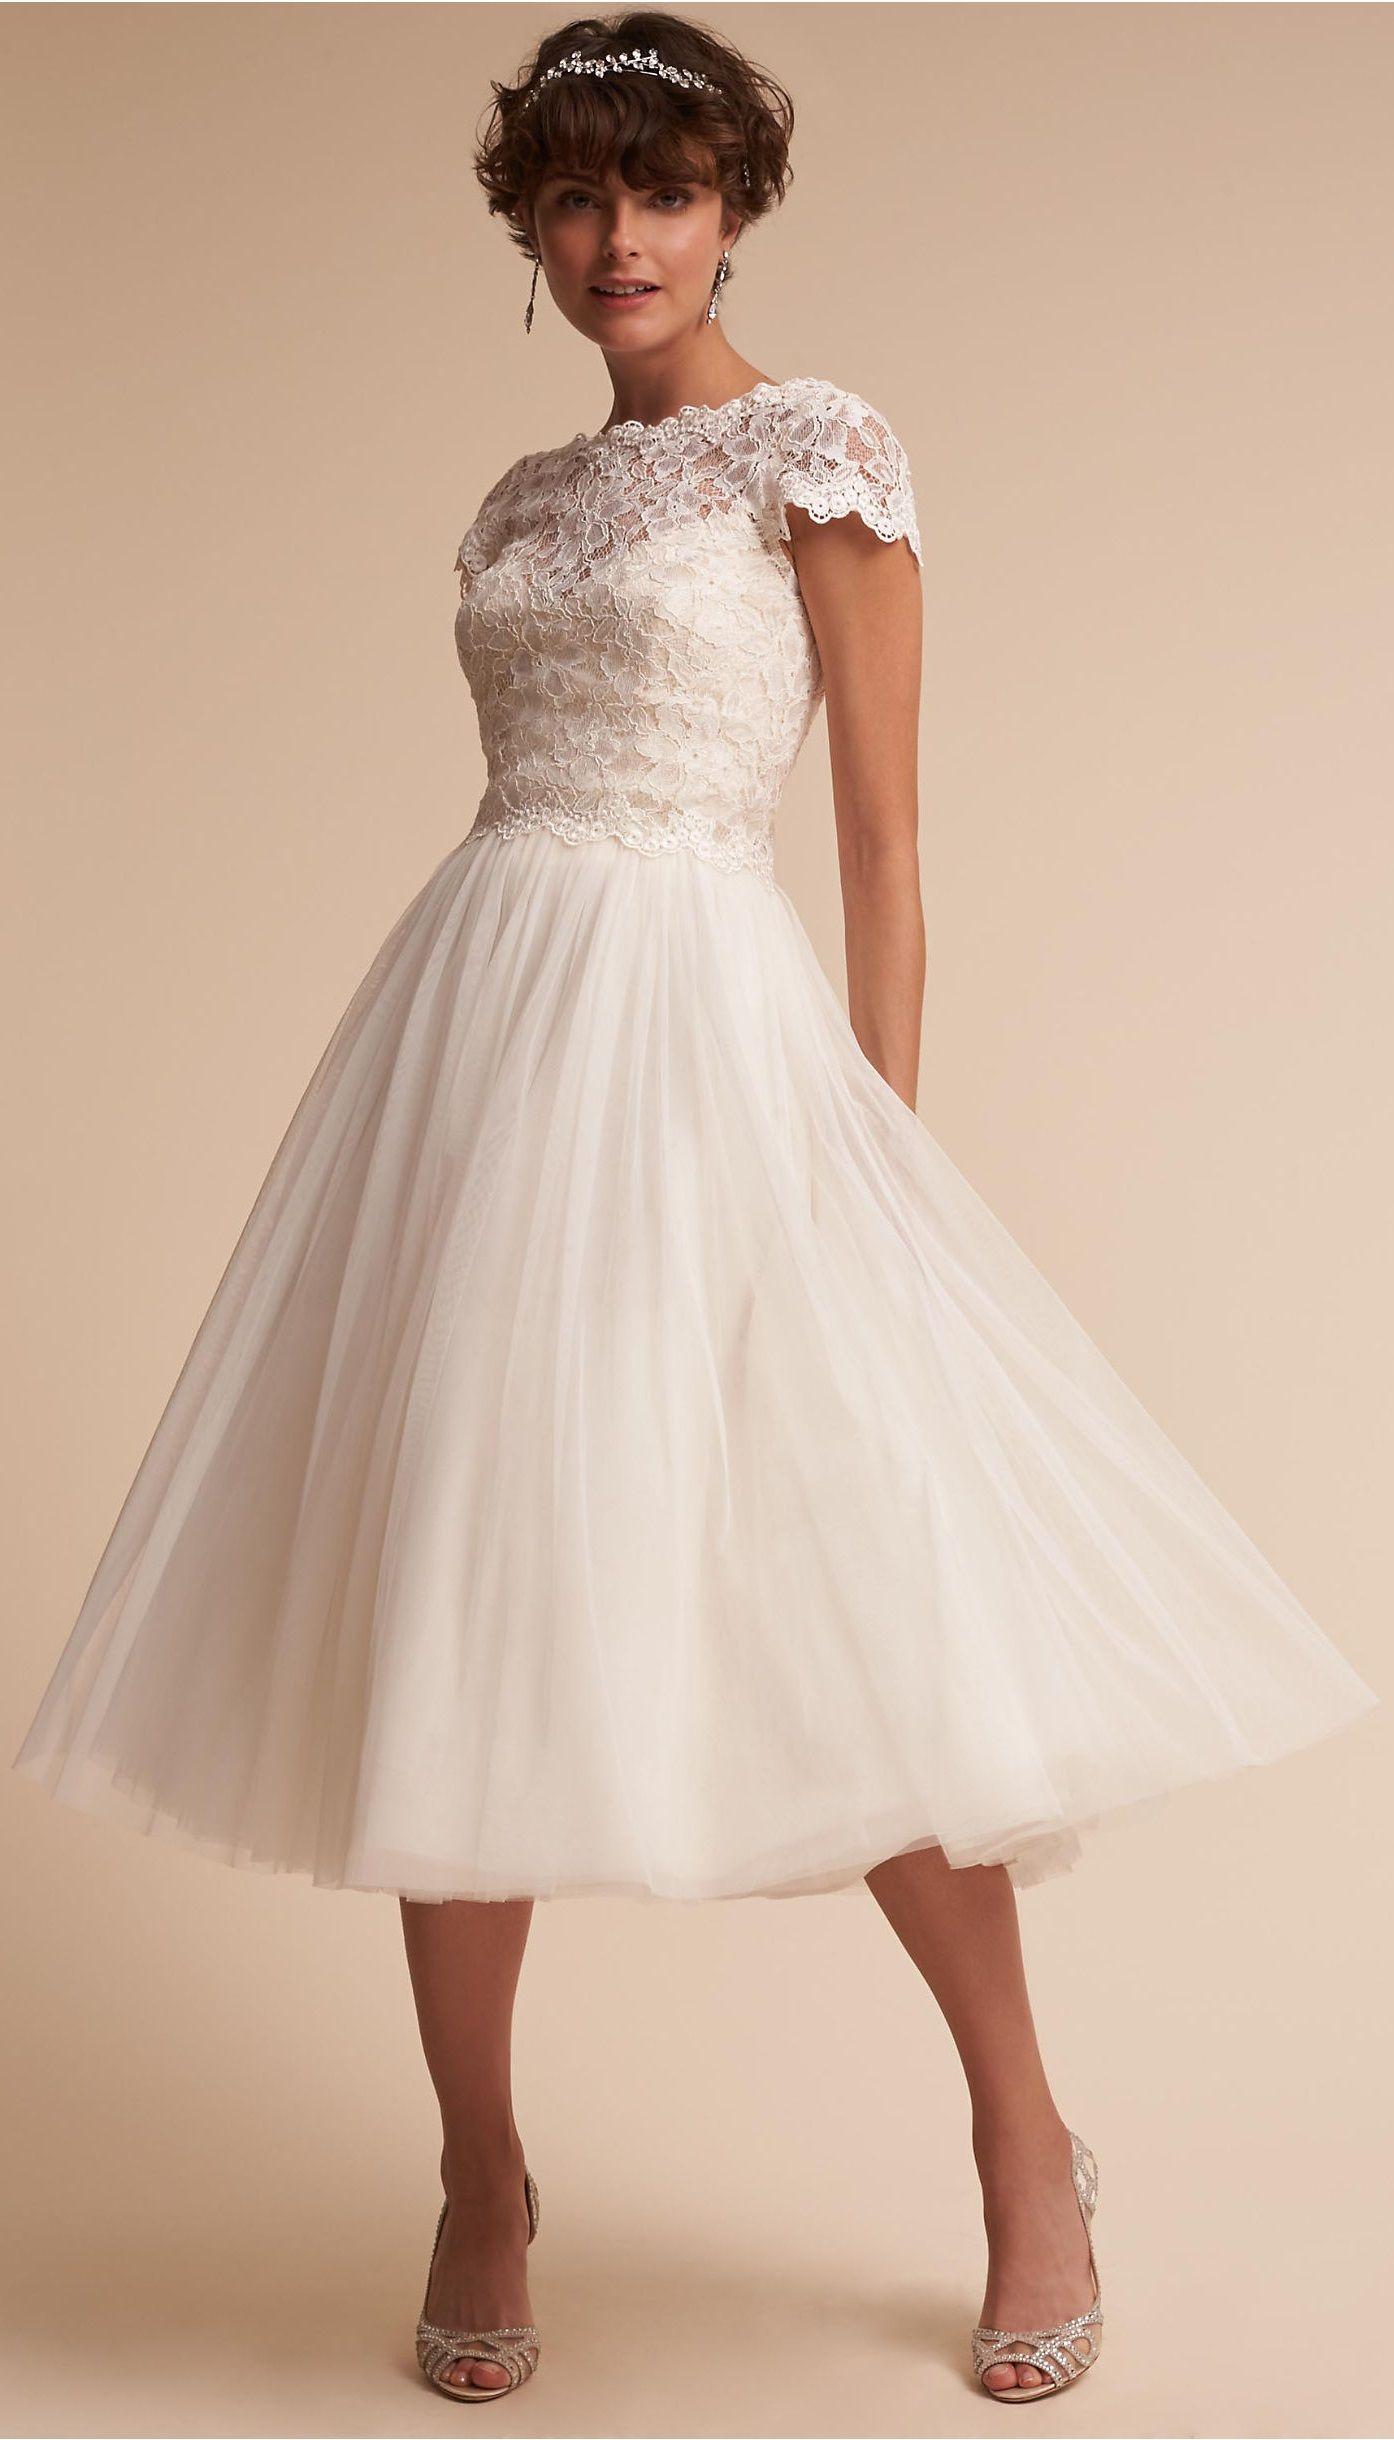 Tea length wedding dress s wedding dress s wedding